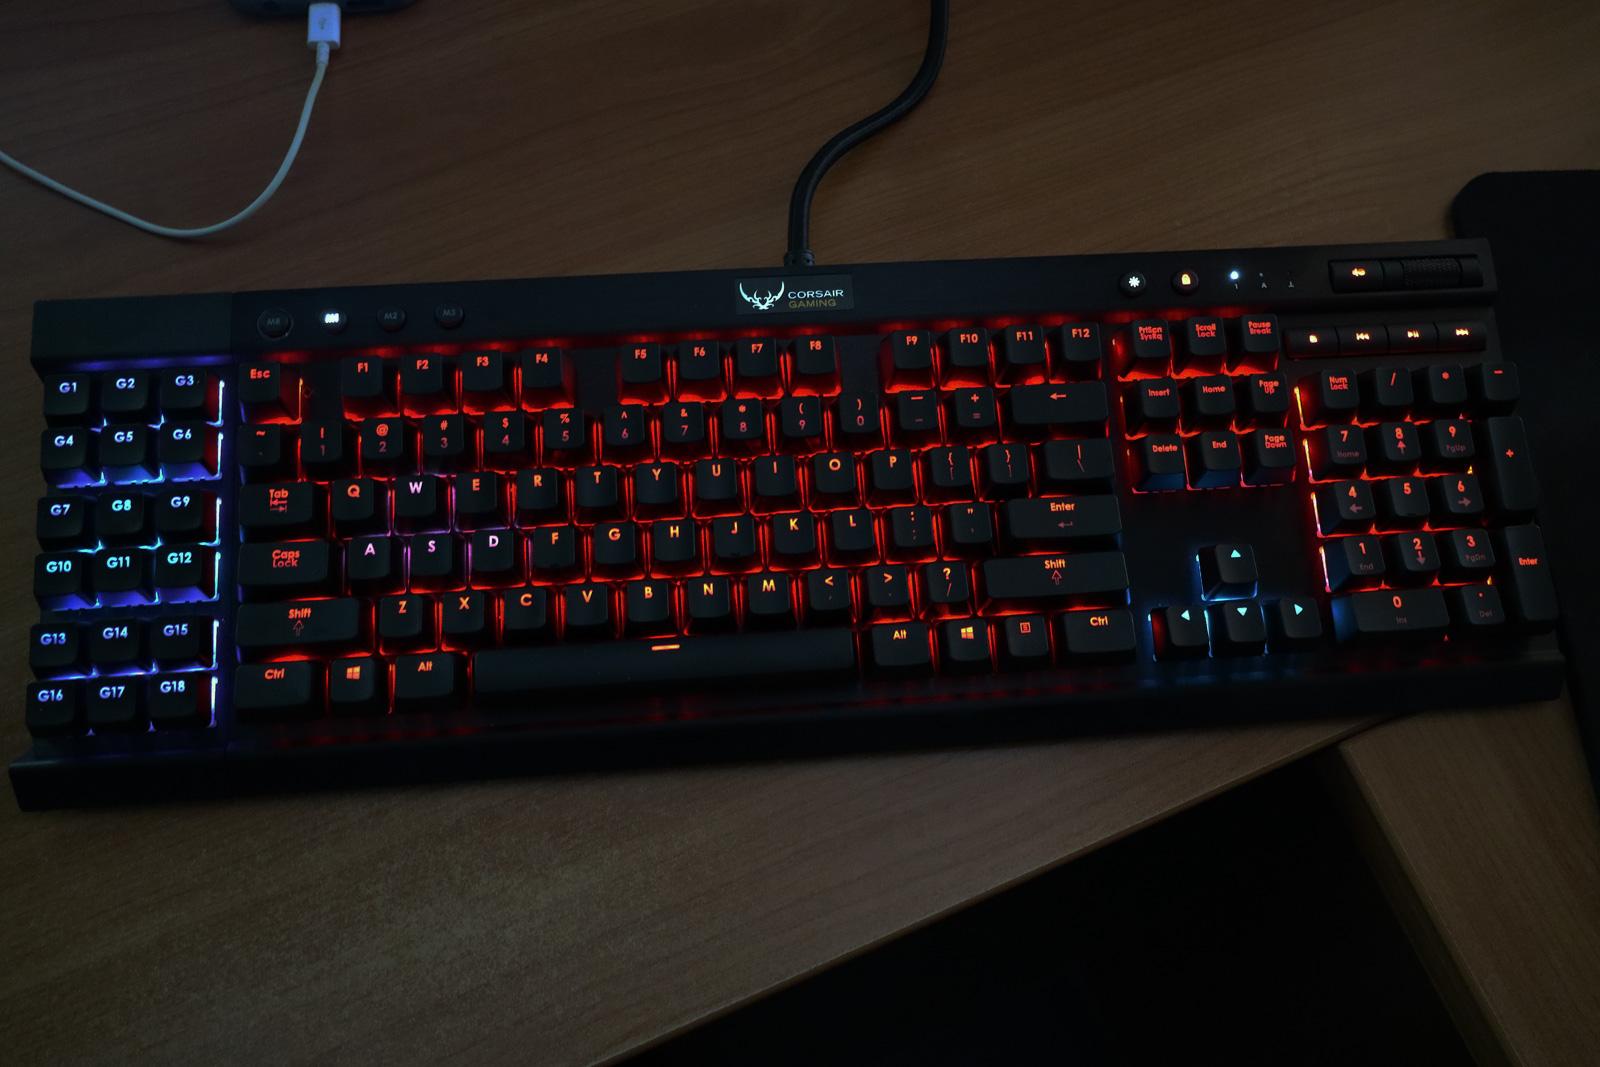 Corsair K95 RGB keyboard mini-review | Evehermit